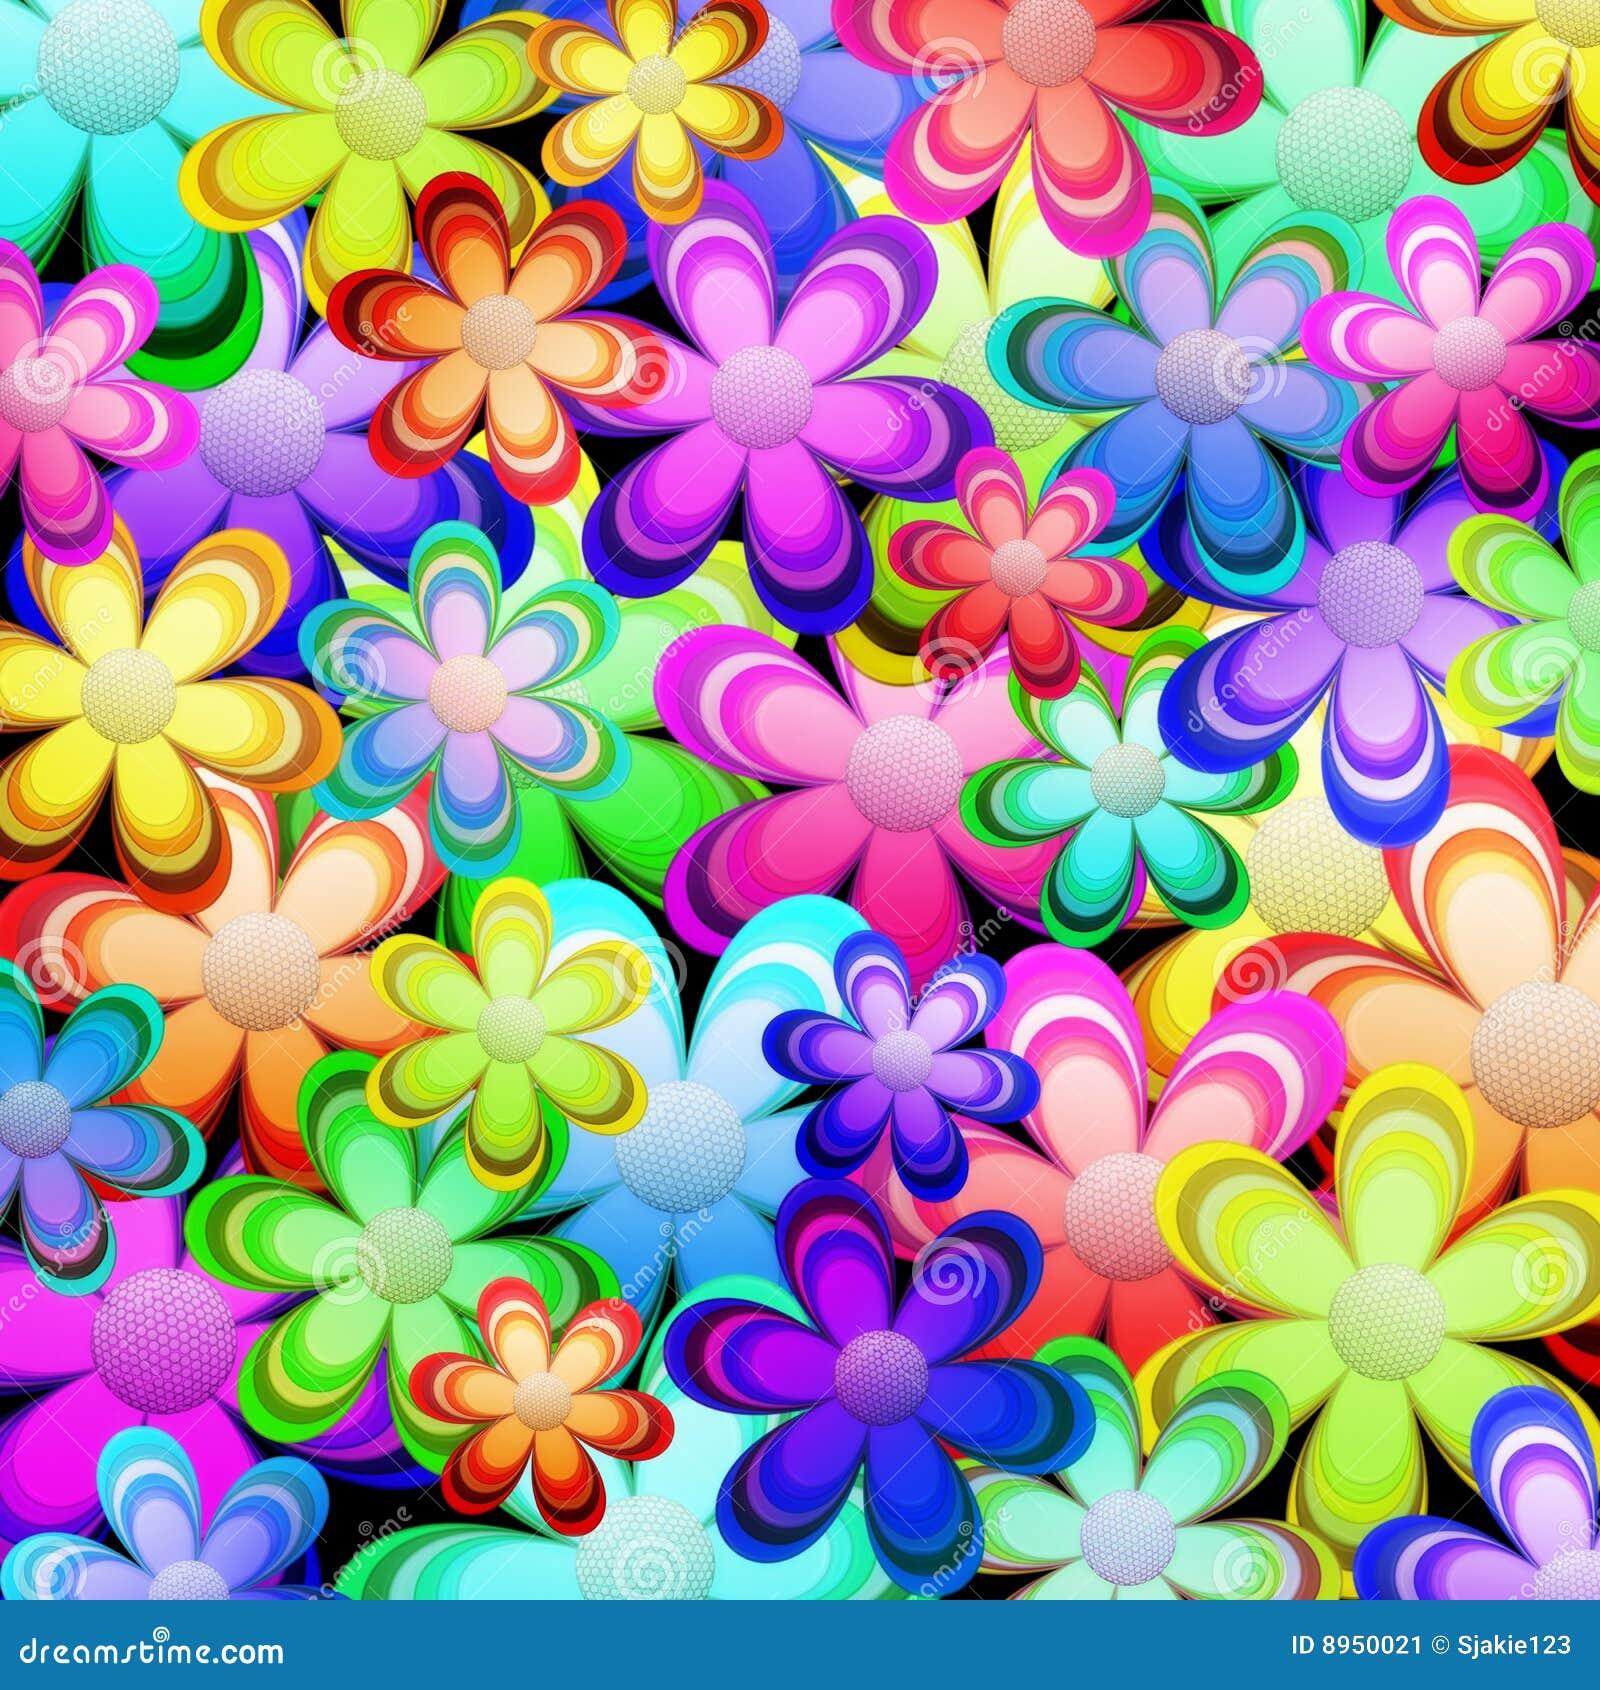 Vibrant color spring stock illustration. Image of flower ...